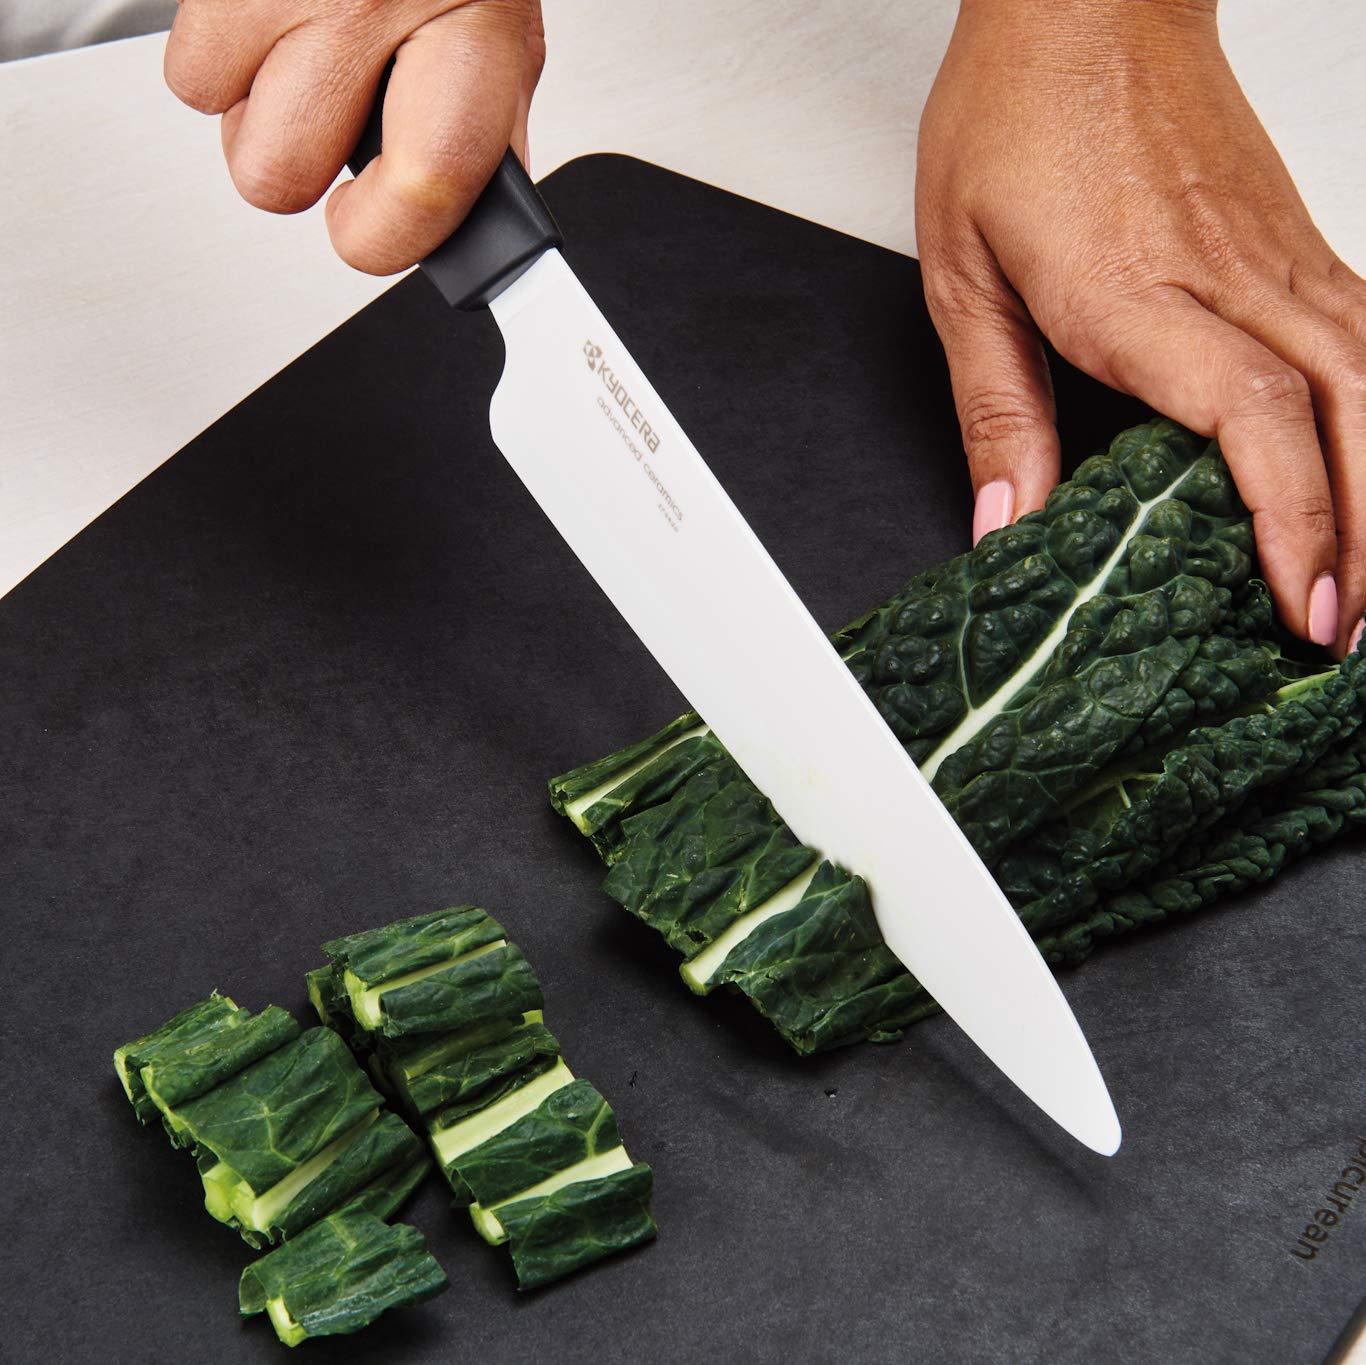 Kyocera FZ-4PC WH-BK Innovation Series Ceramic Knife, 7''/5.5''/5''/4.5'', WHITE by Kyocera (Image #3)